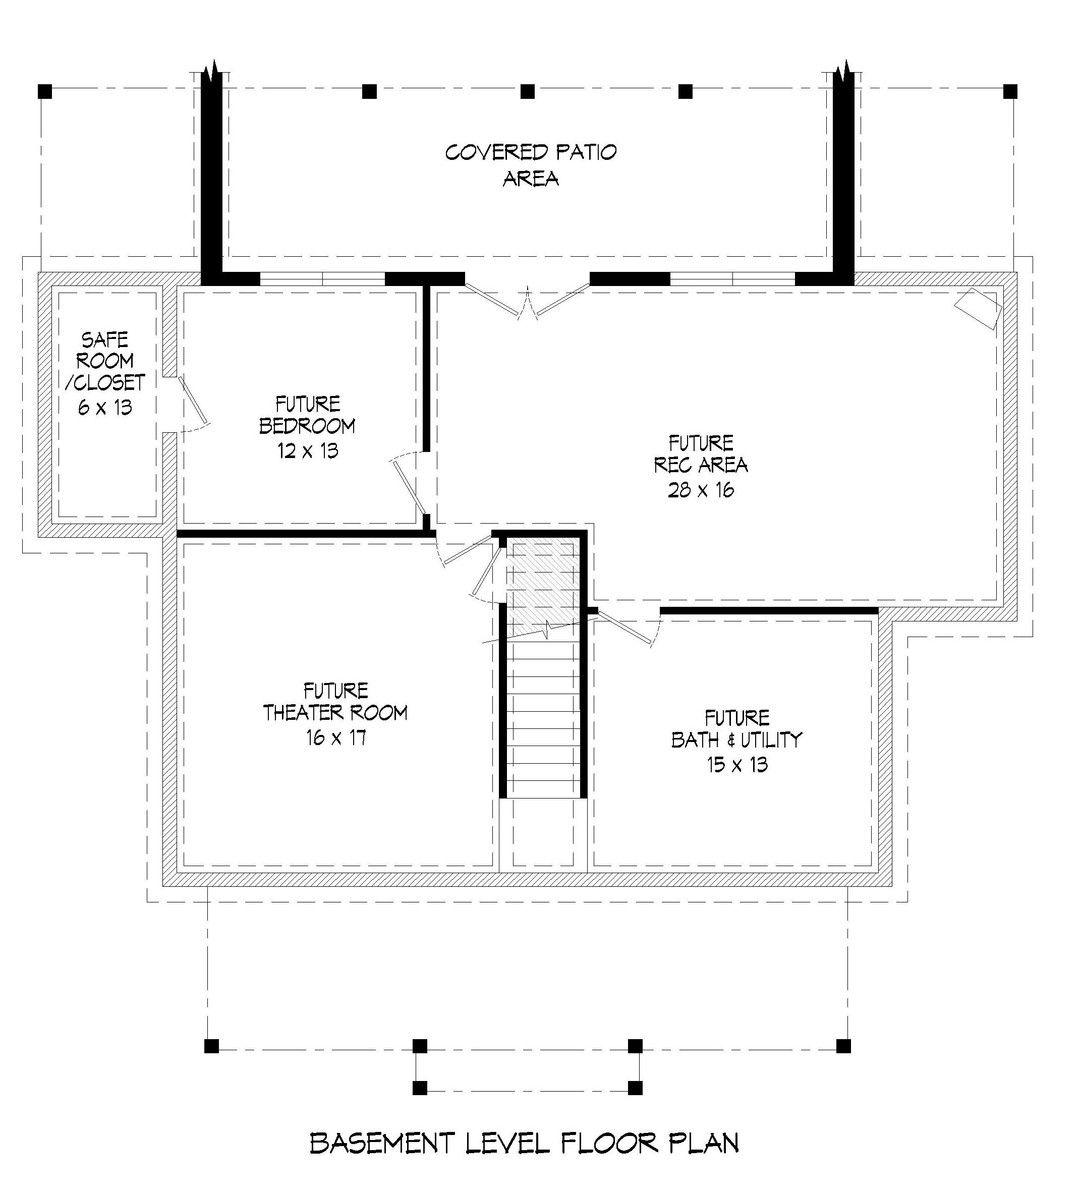 House Plan 763 1211